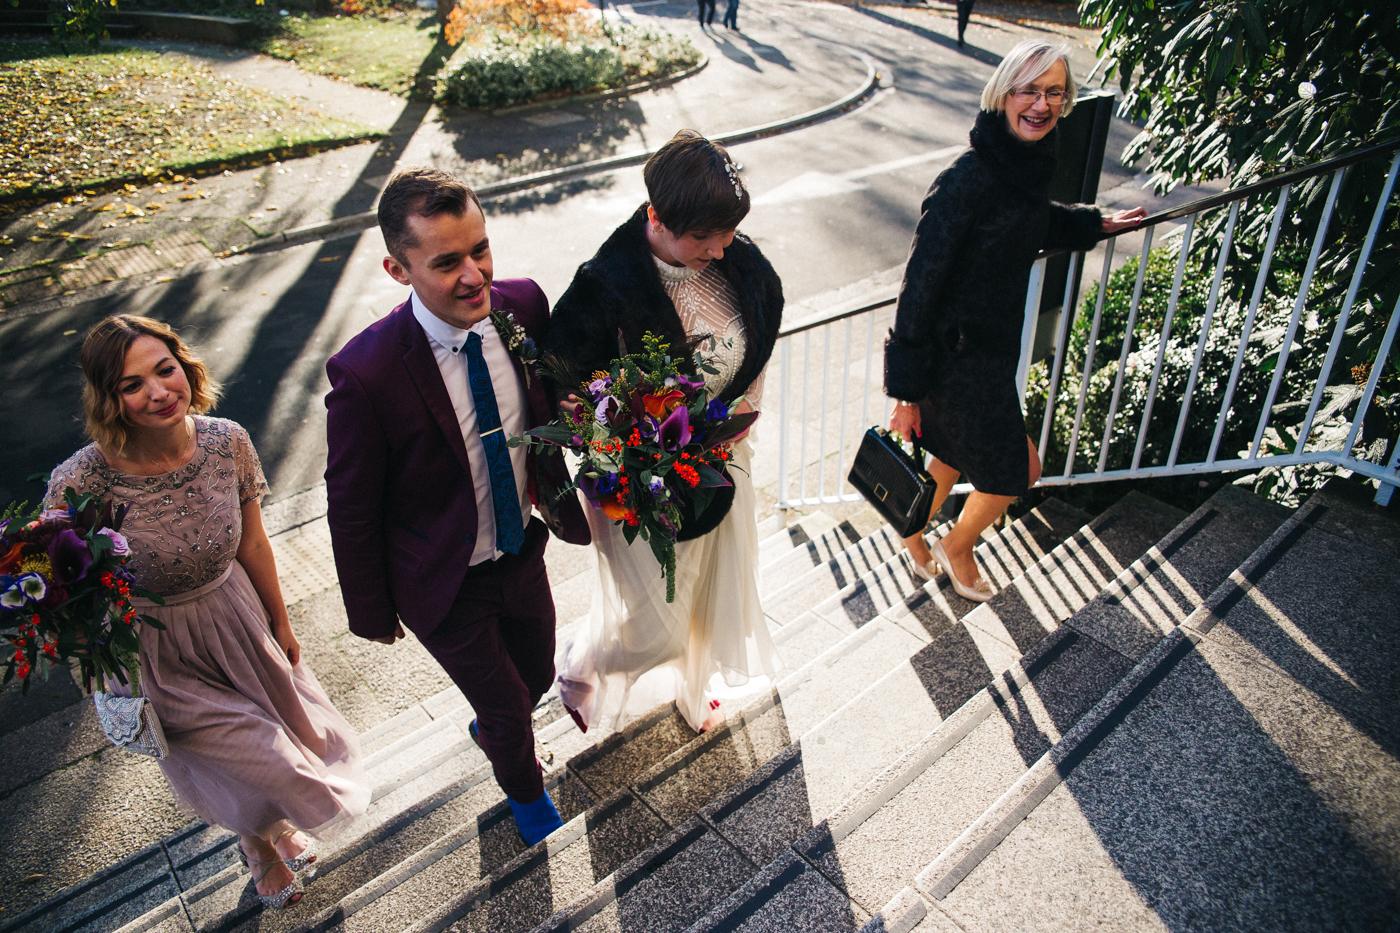 teesside-newcastle-gateshead-wedding-photography-photographer-creative-0026.jpg